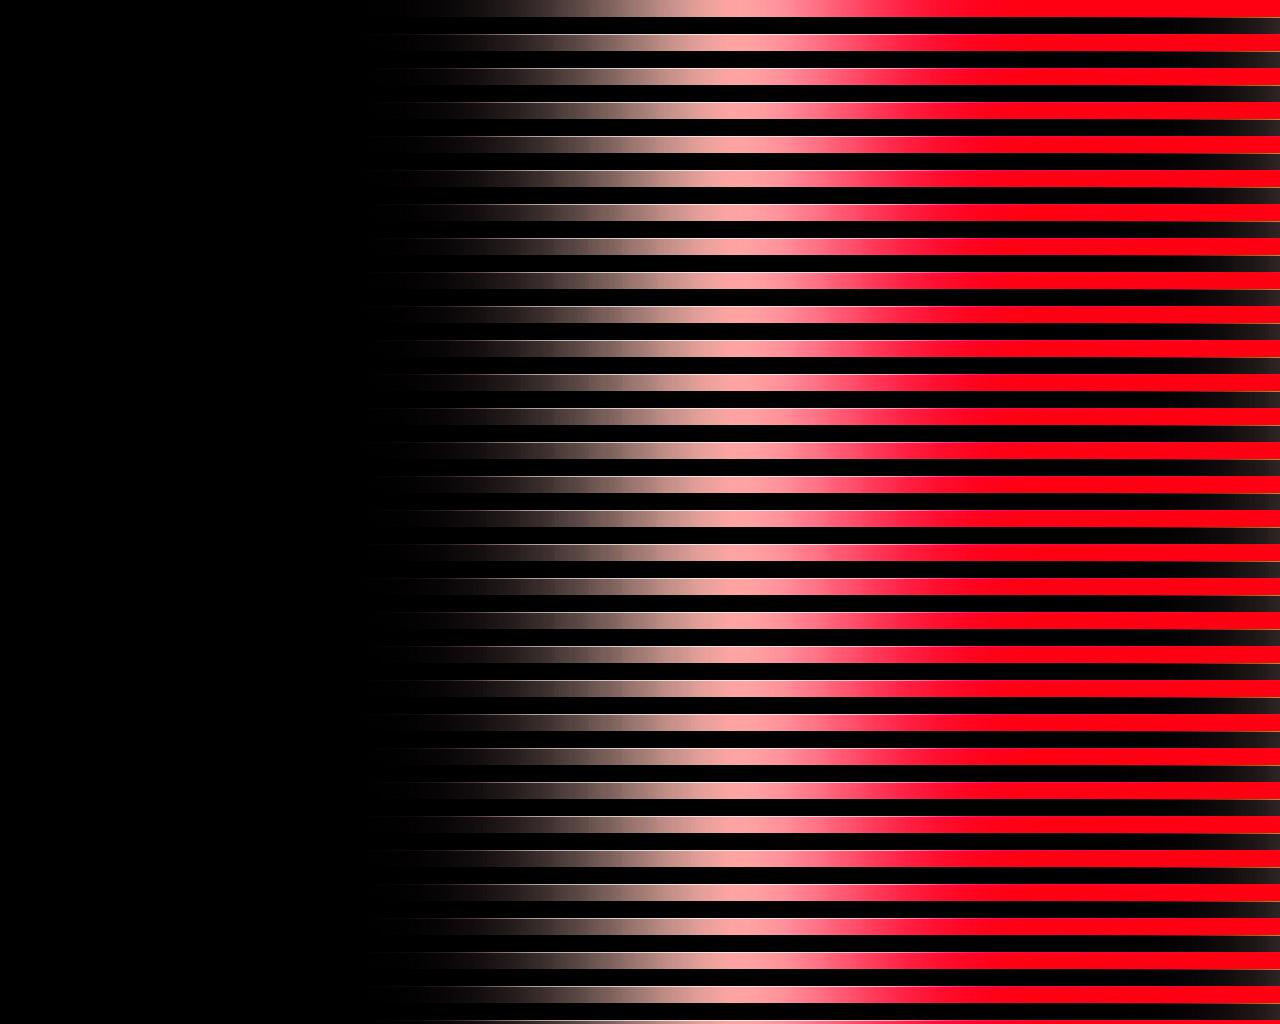 Wallpaper Stripes Design : Sh yn design stripe pattern wallpaper red to pink